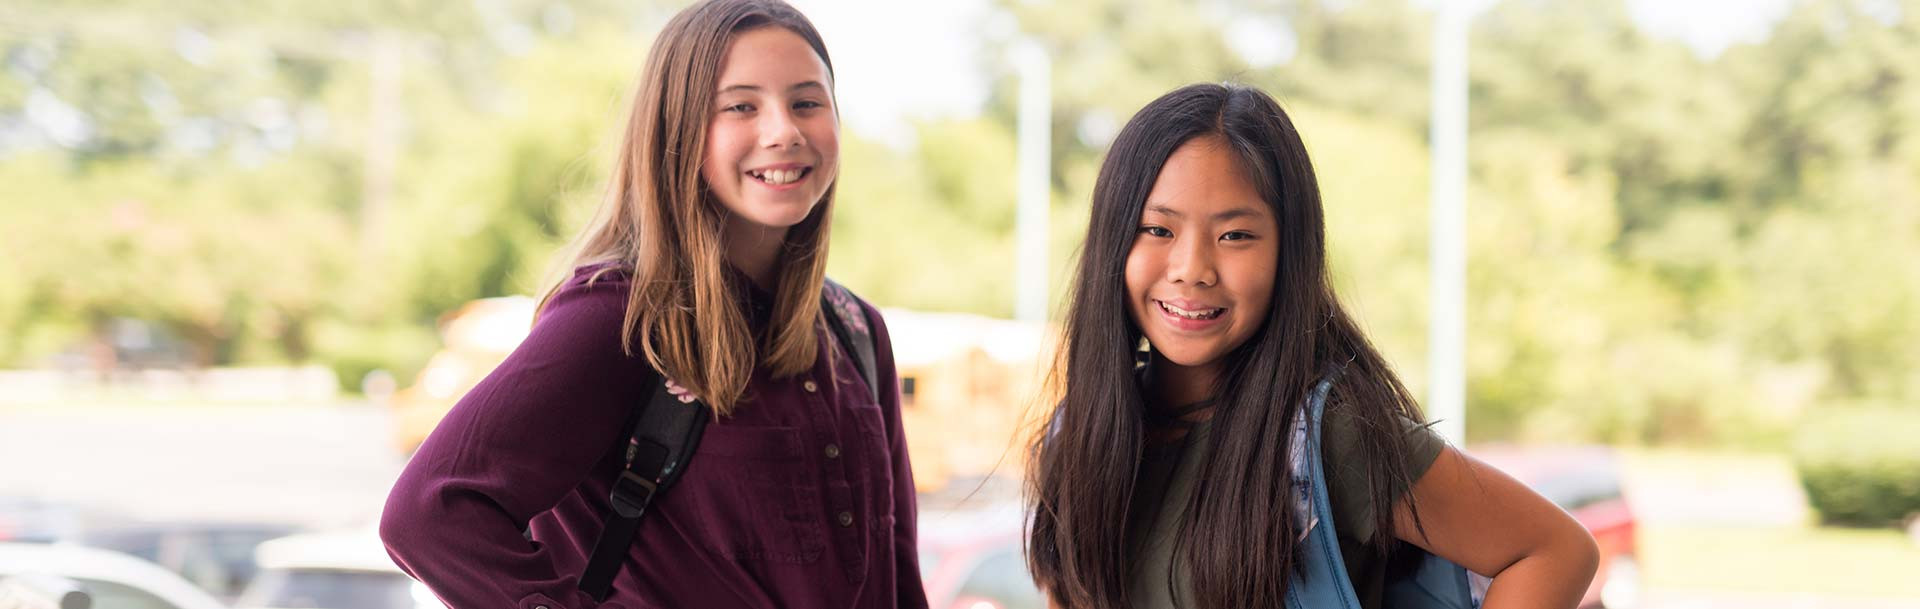 NorfolkChristianSchool-VA-Private-StudentsFriends-Banner-2020